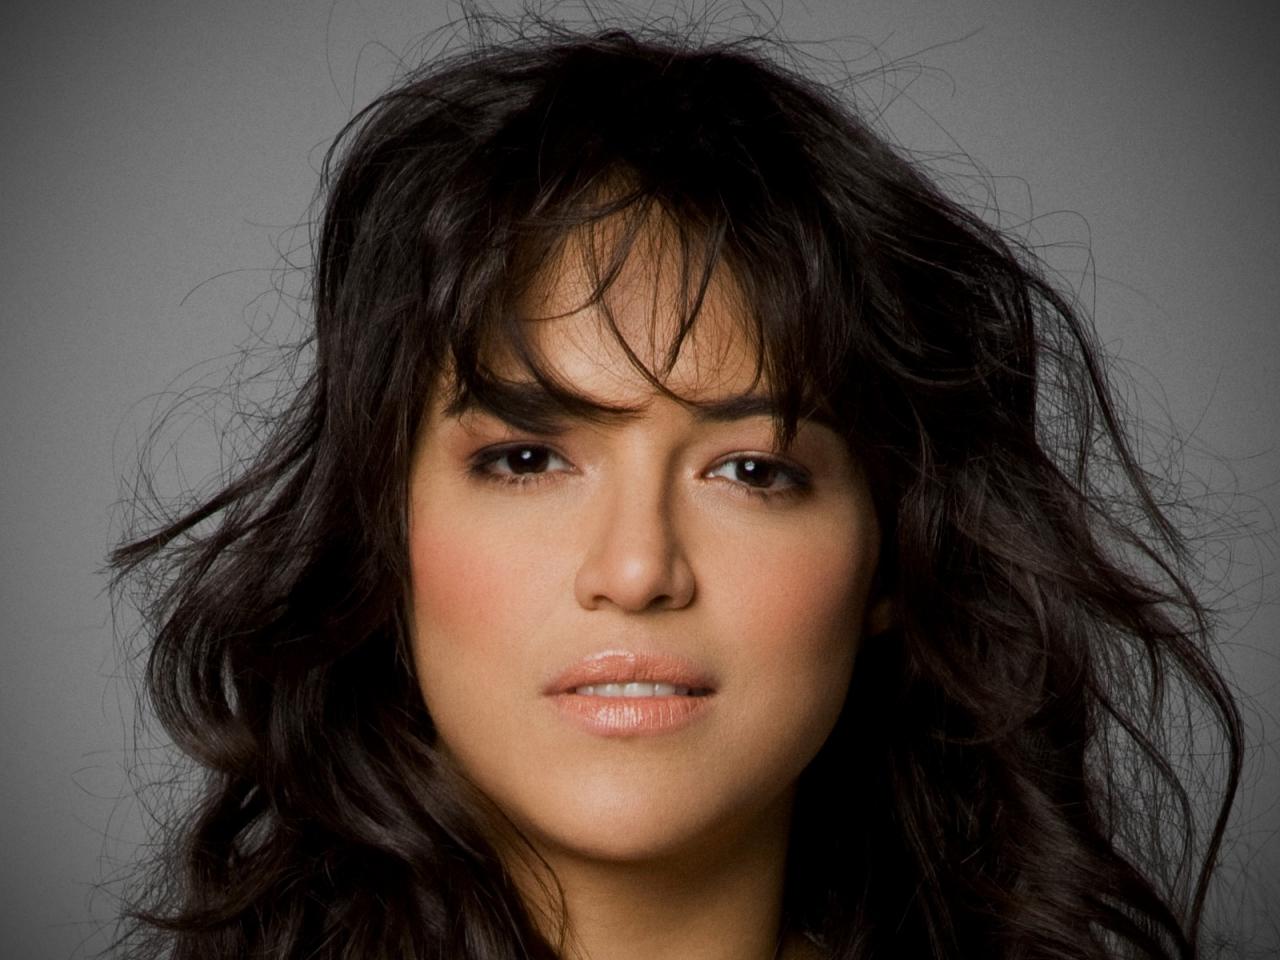 Michelle Rodriguez rostro - 1280x960